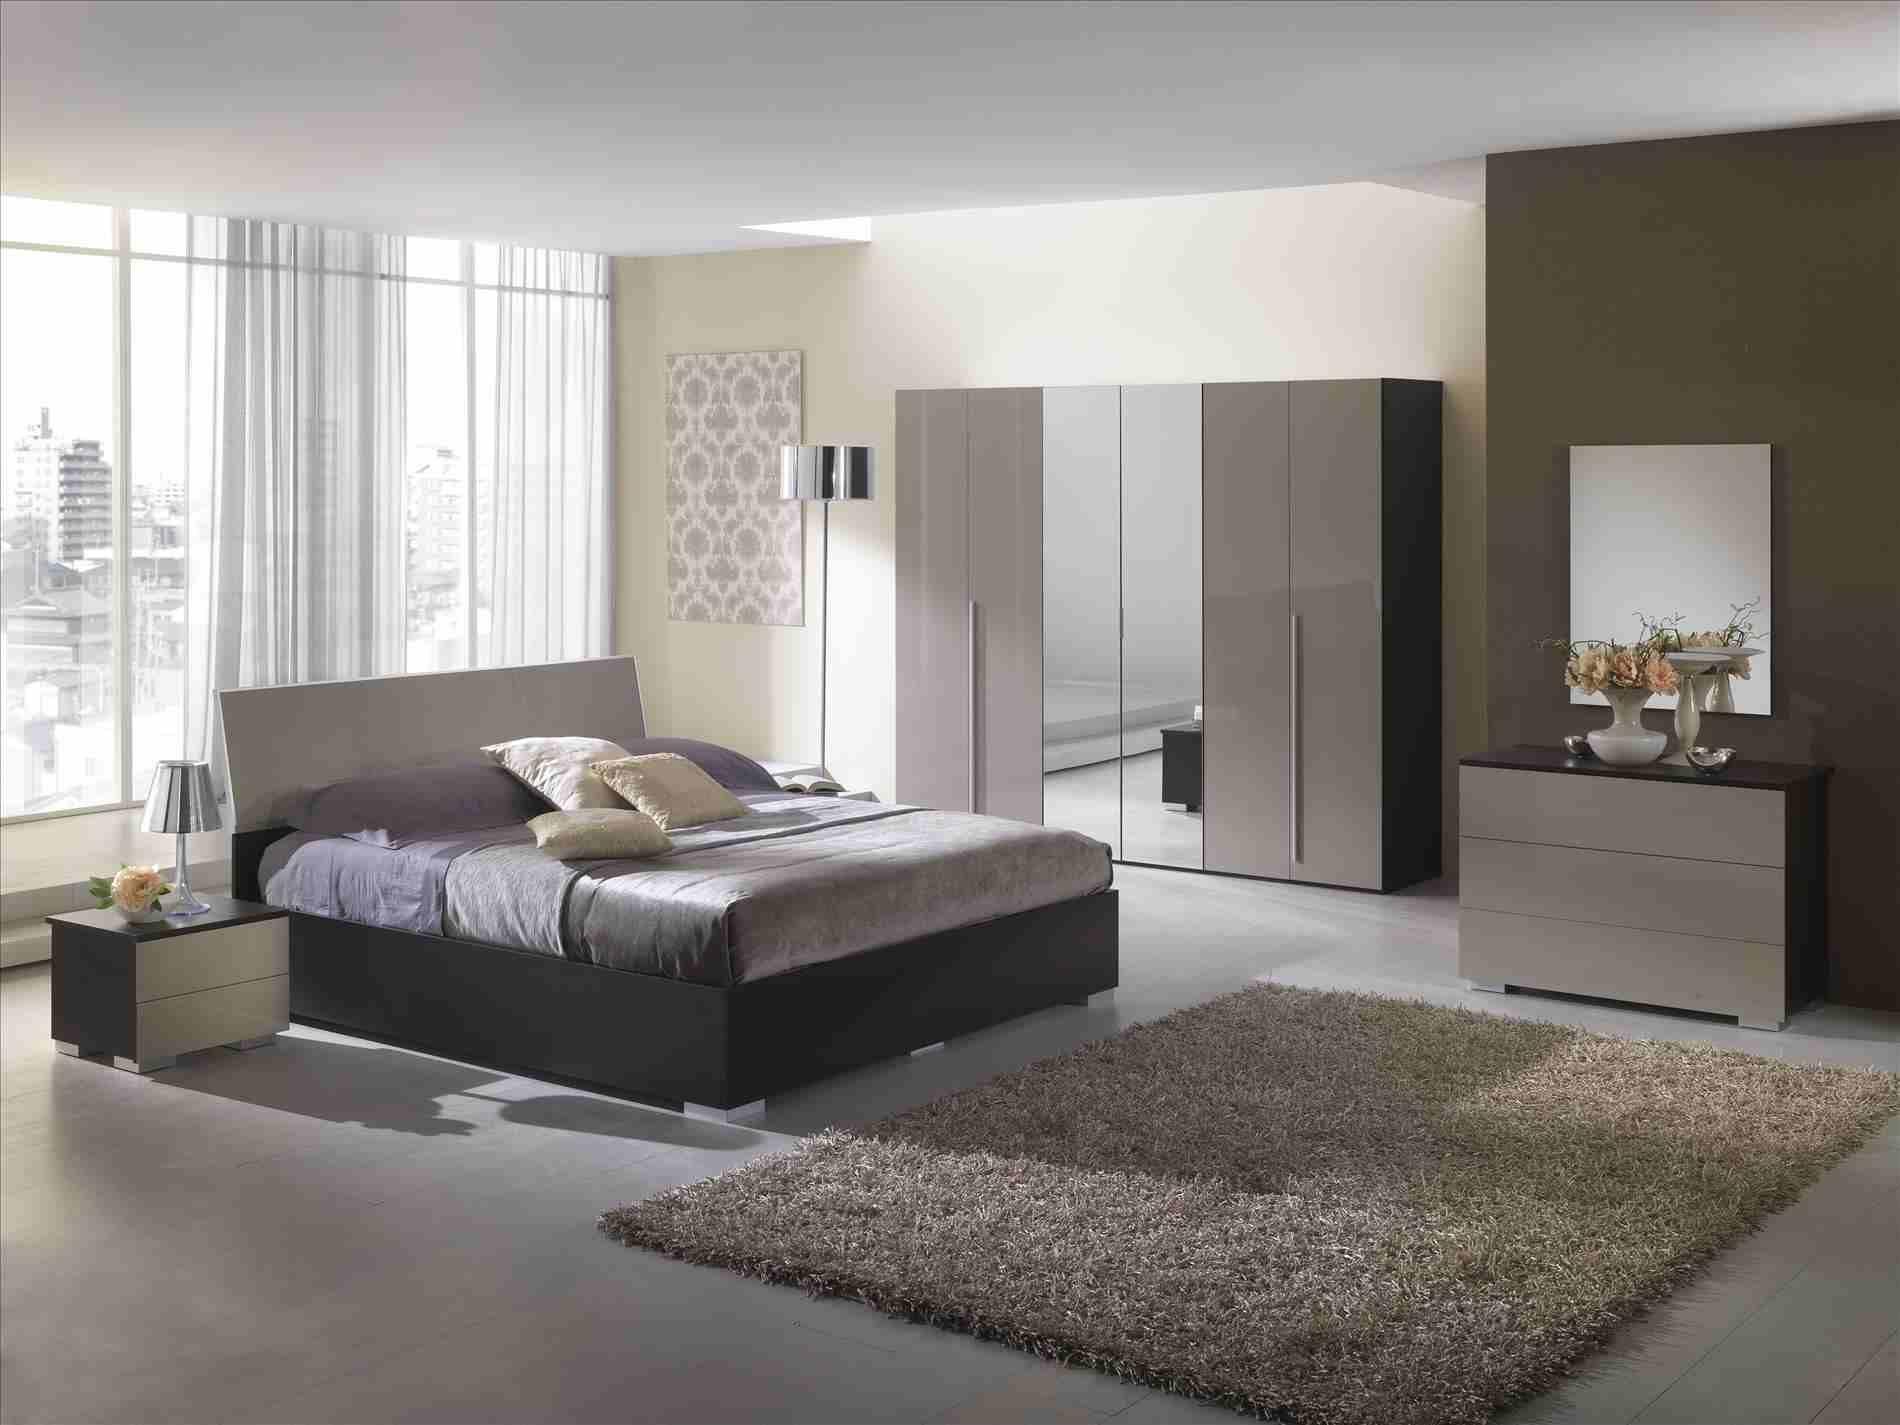 Simple Bedroom Furniture Designs With Images Modern Bedroom